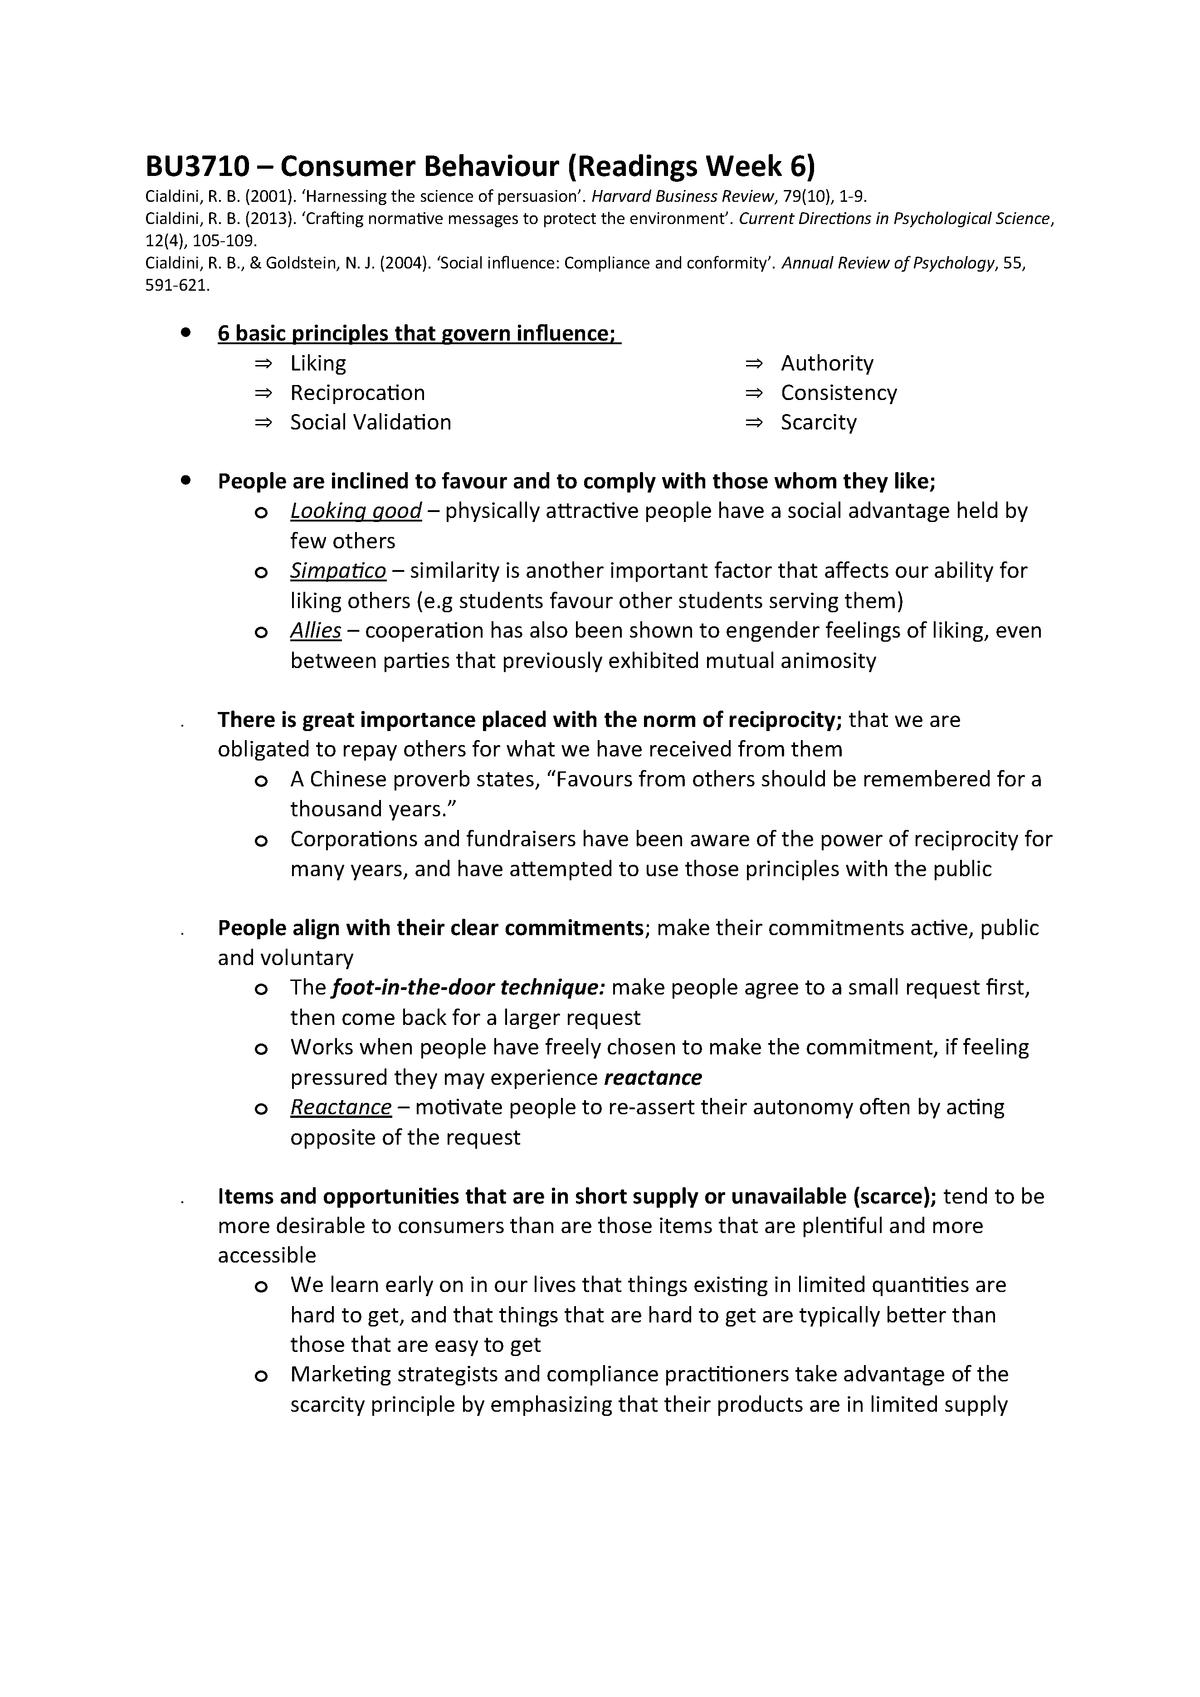 BU3710 - Consumer Behaviour (Readings Week 6) - BU3710